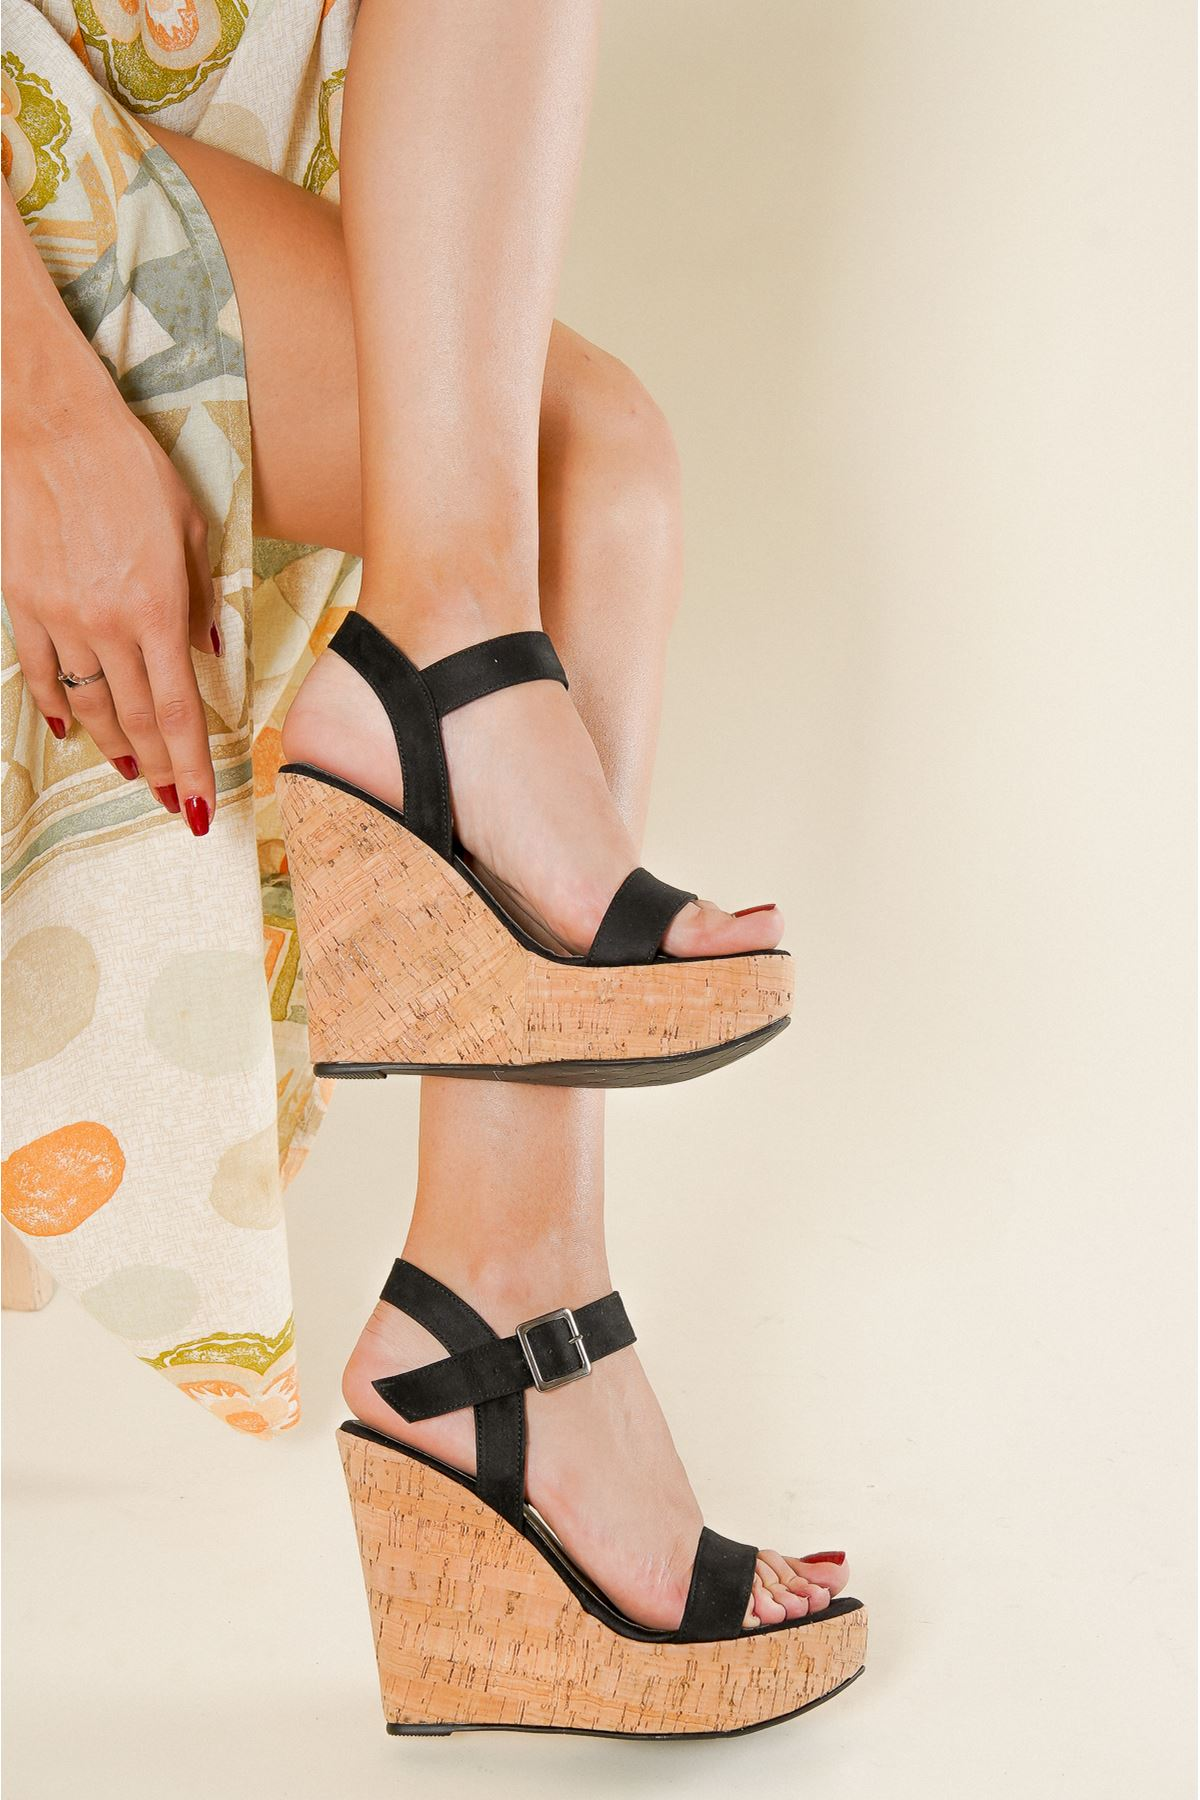 Venüs Mantar Siyah Süet Dolgu Topuklu Ayakkabı